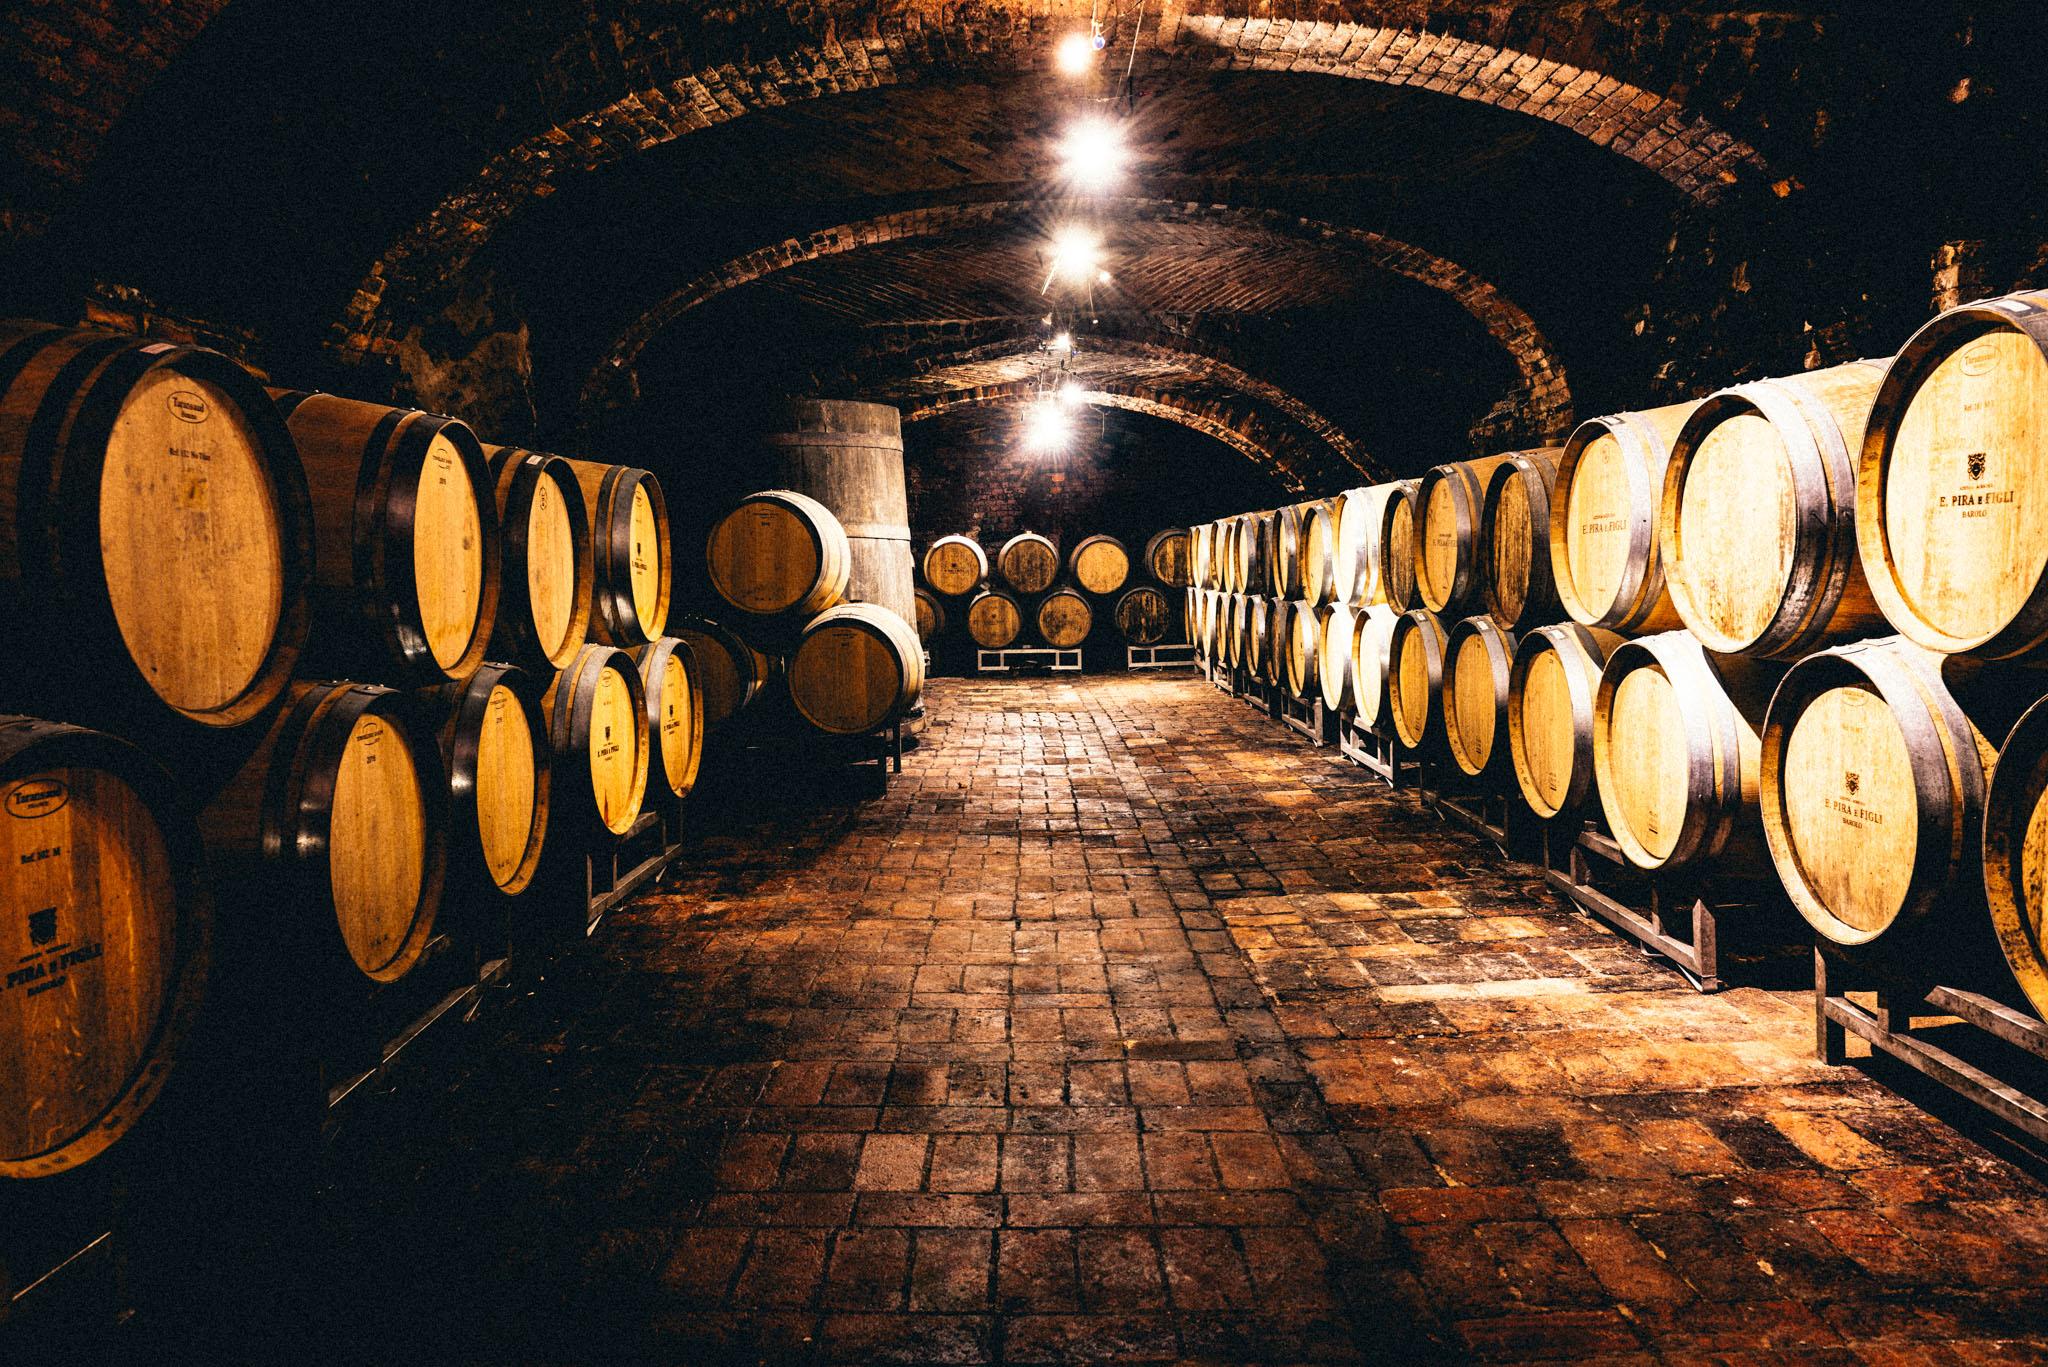 Italy : Piedmont : Chiari Boschis' cellar